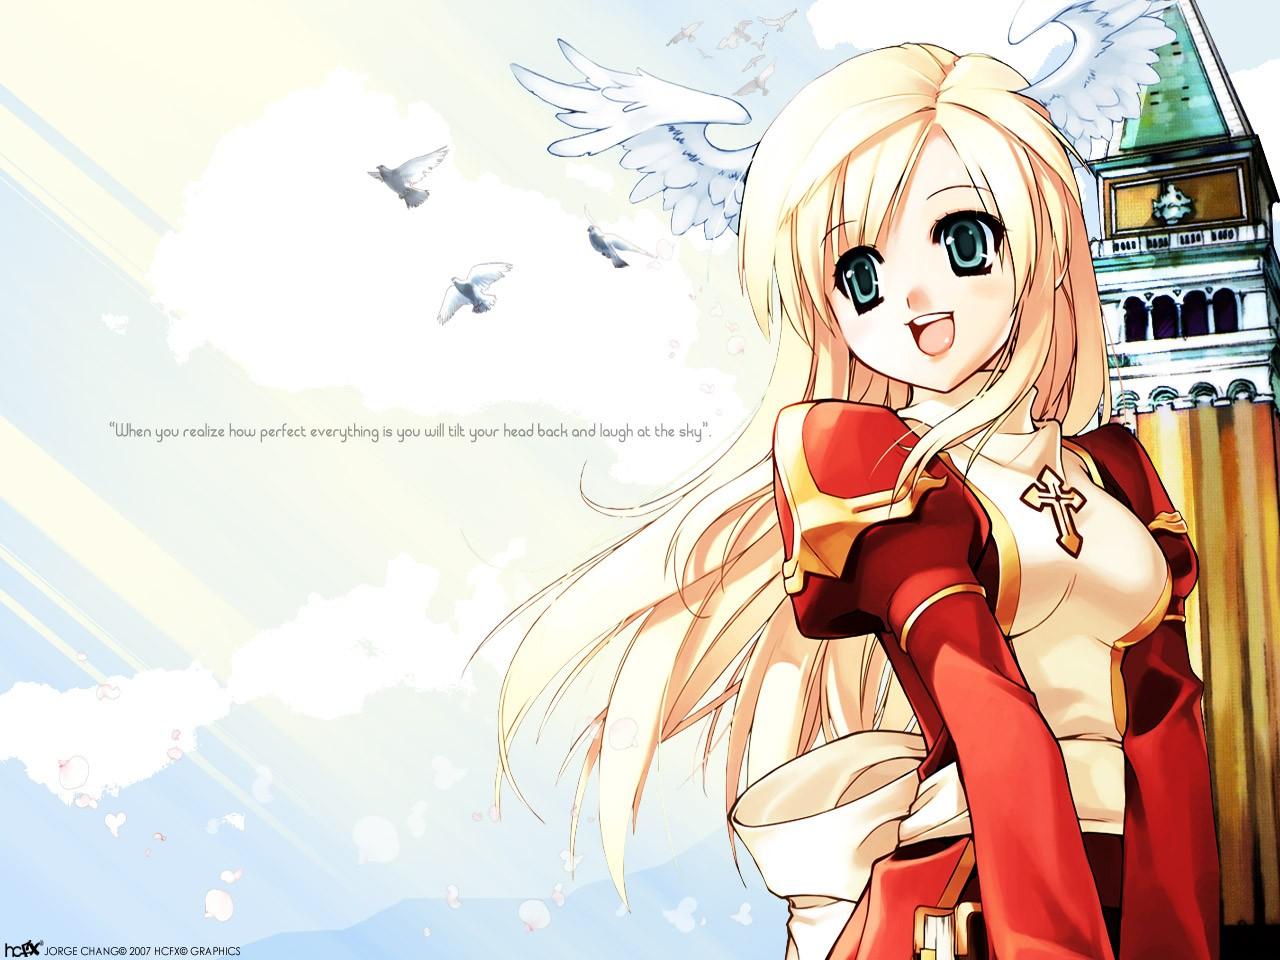 http://3.bp.blogspot.com/-BhqgCouctvg/UNdf0otAQkI/AAAAAAAAKPs/aKKLZ6peKUE/s1600/blondes-birds-ragnarok-online-animal-ears-priest-anime-HD-Wallpapers.jpg